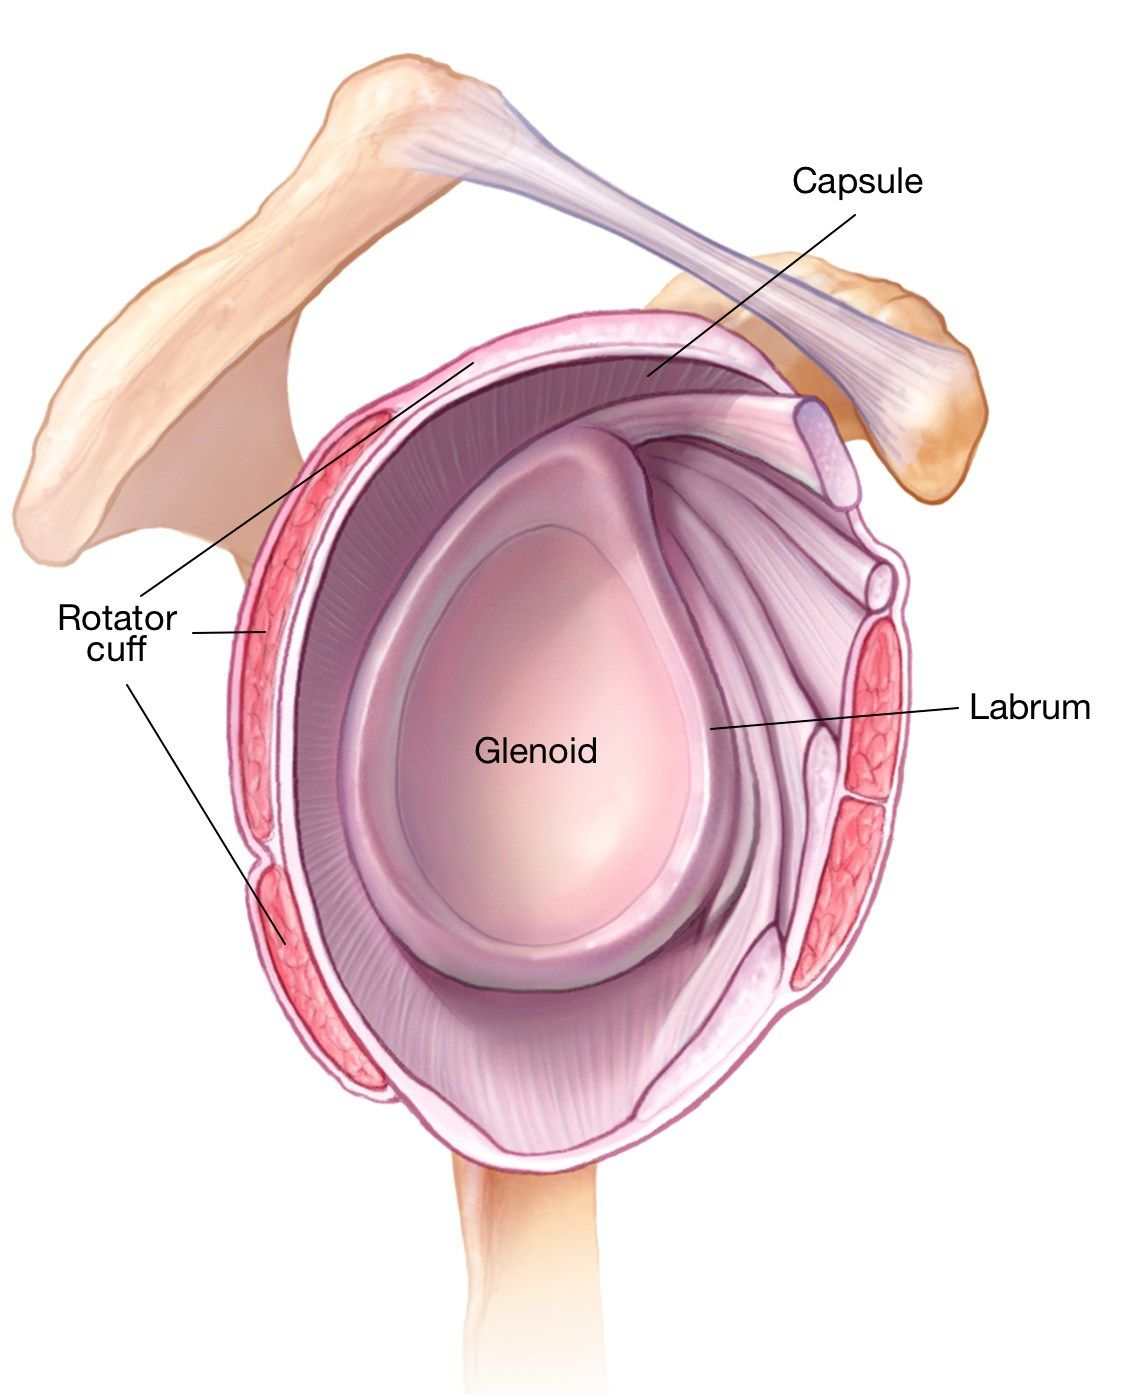 Torn Labrum Of The Shoulder  Causes  Symptoms  Treatment